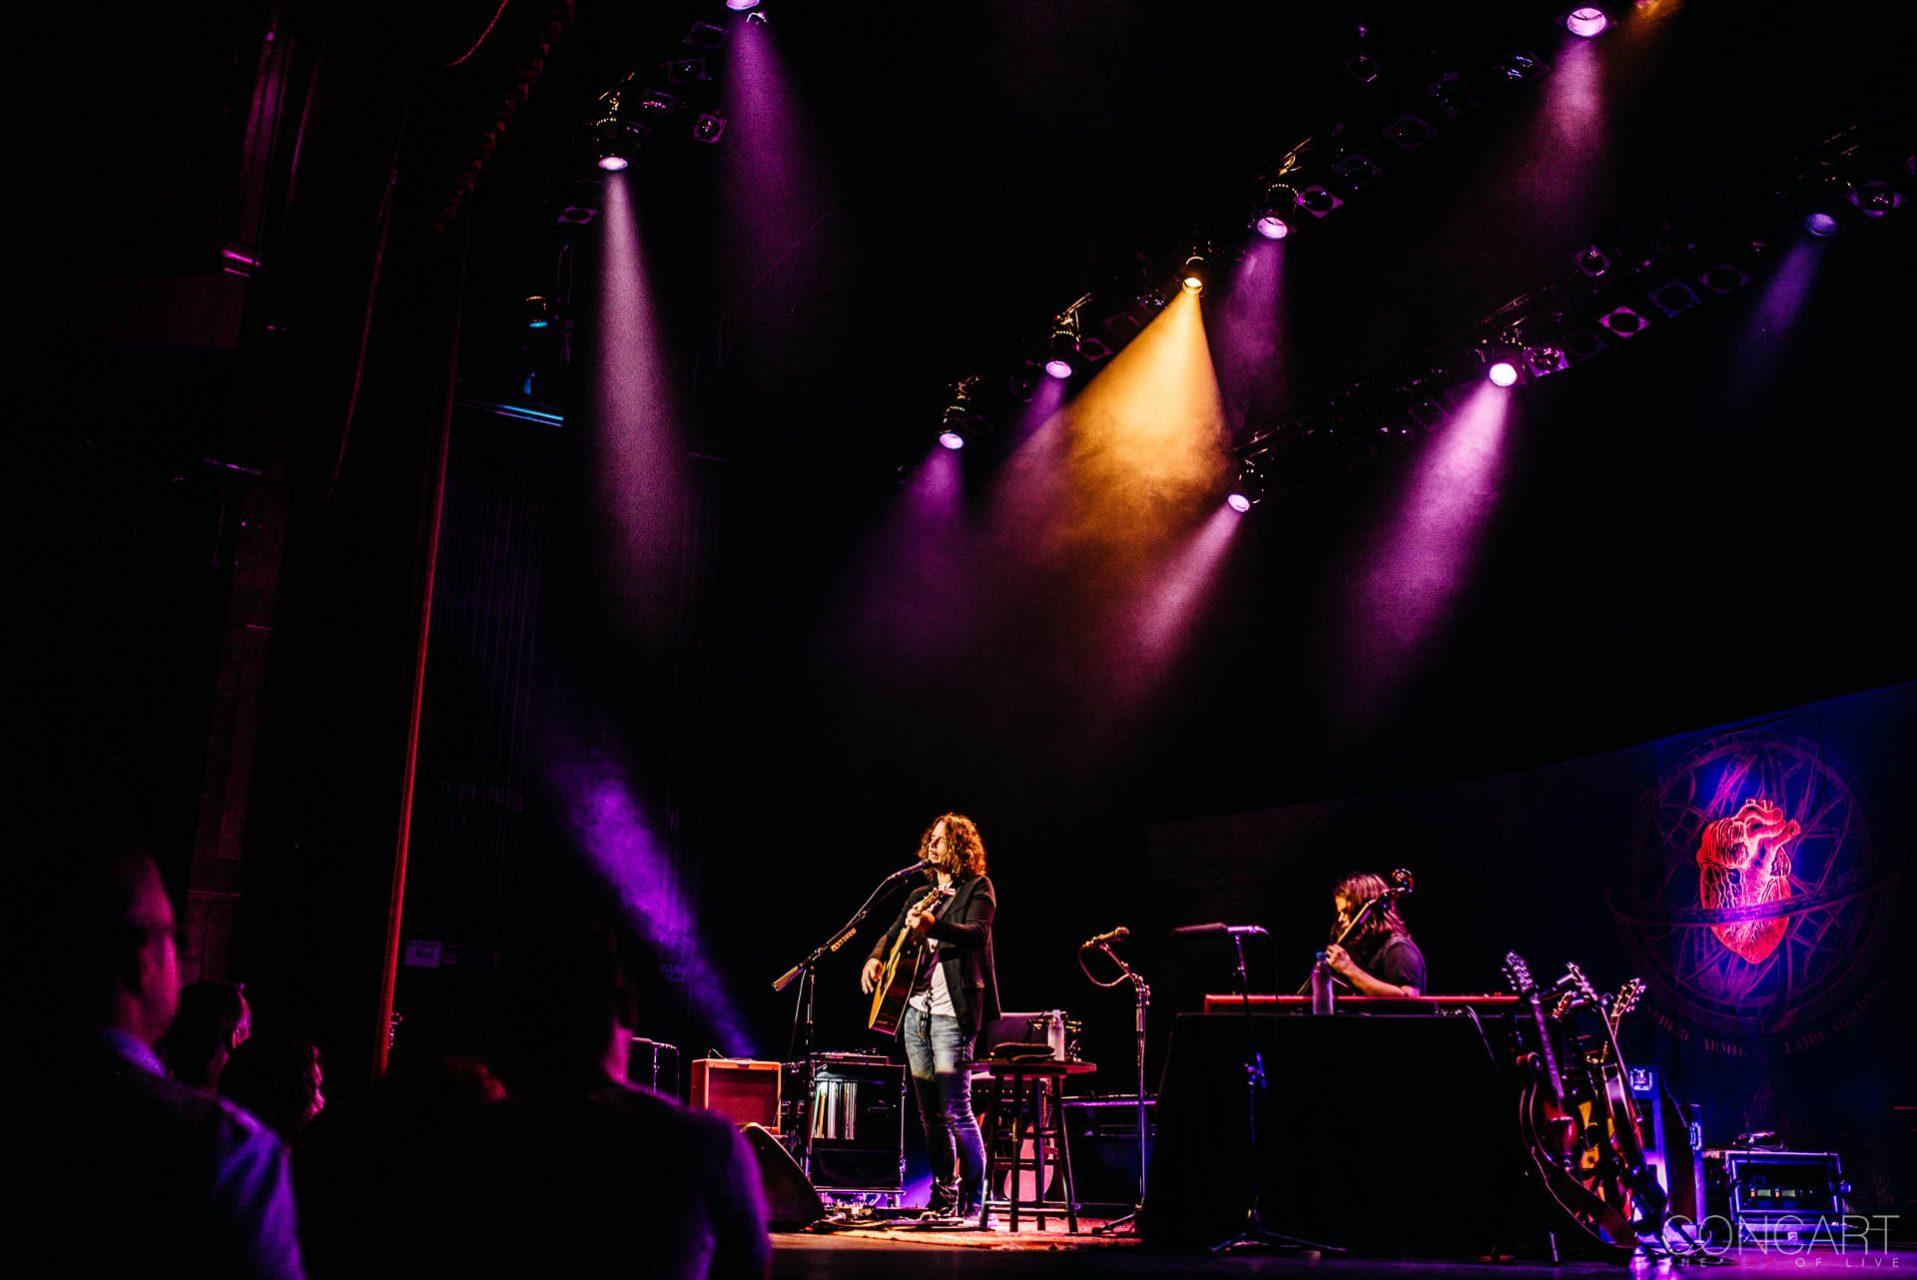 Chris Cornell photo by Sean Molin 27